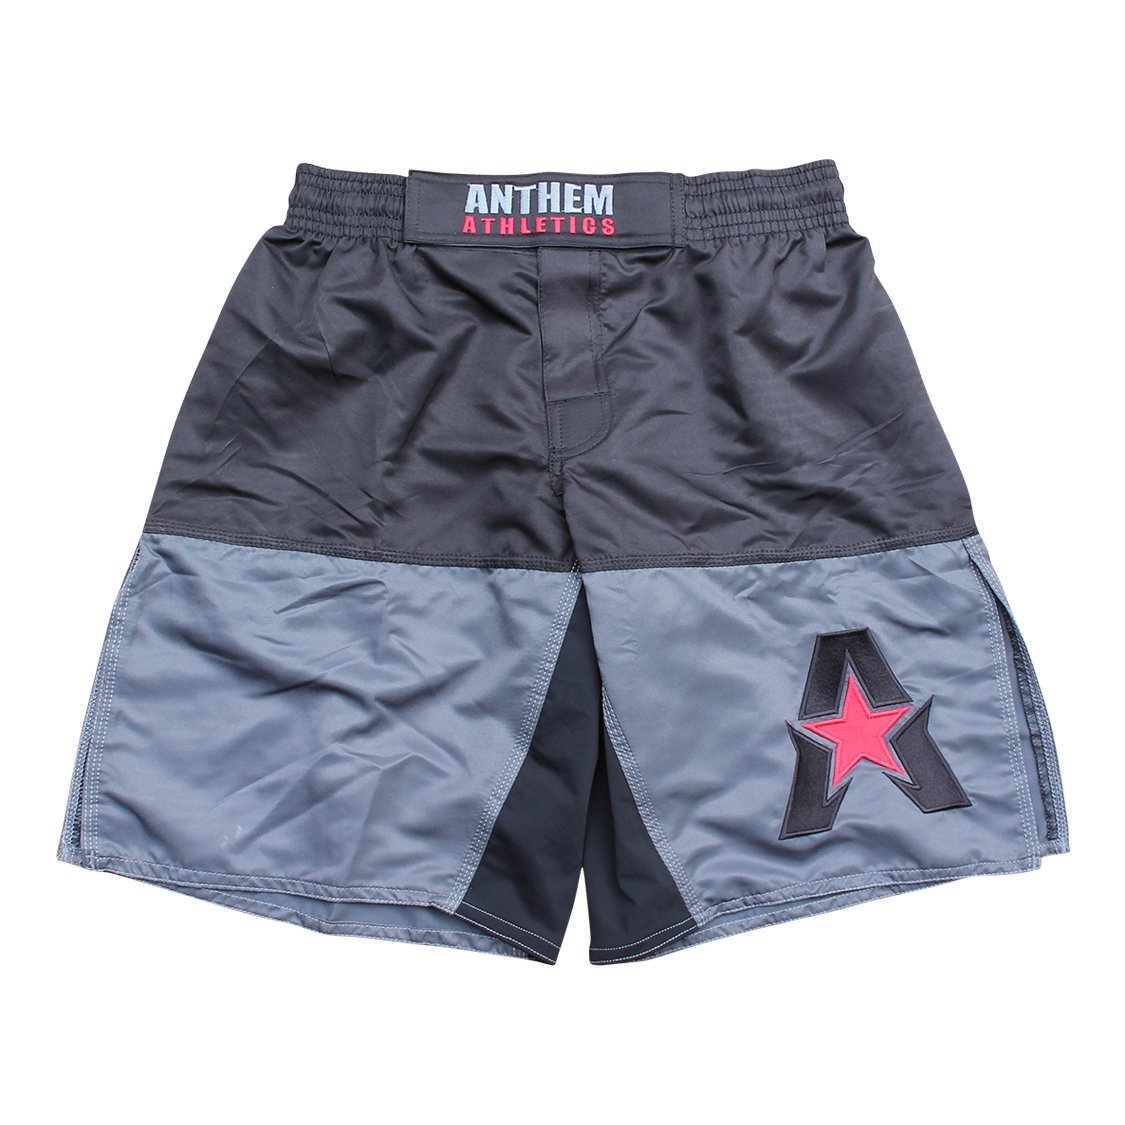 Anthem Athletics 50/50 MMA Fight Shorts - BJJ, Muay Thai, WOD, Cross-Training, OCR - Black, Grey & Red - Large